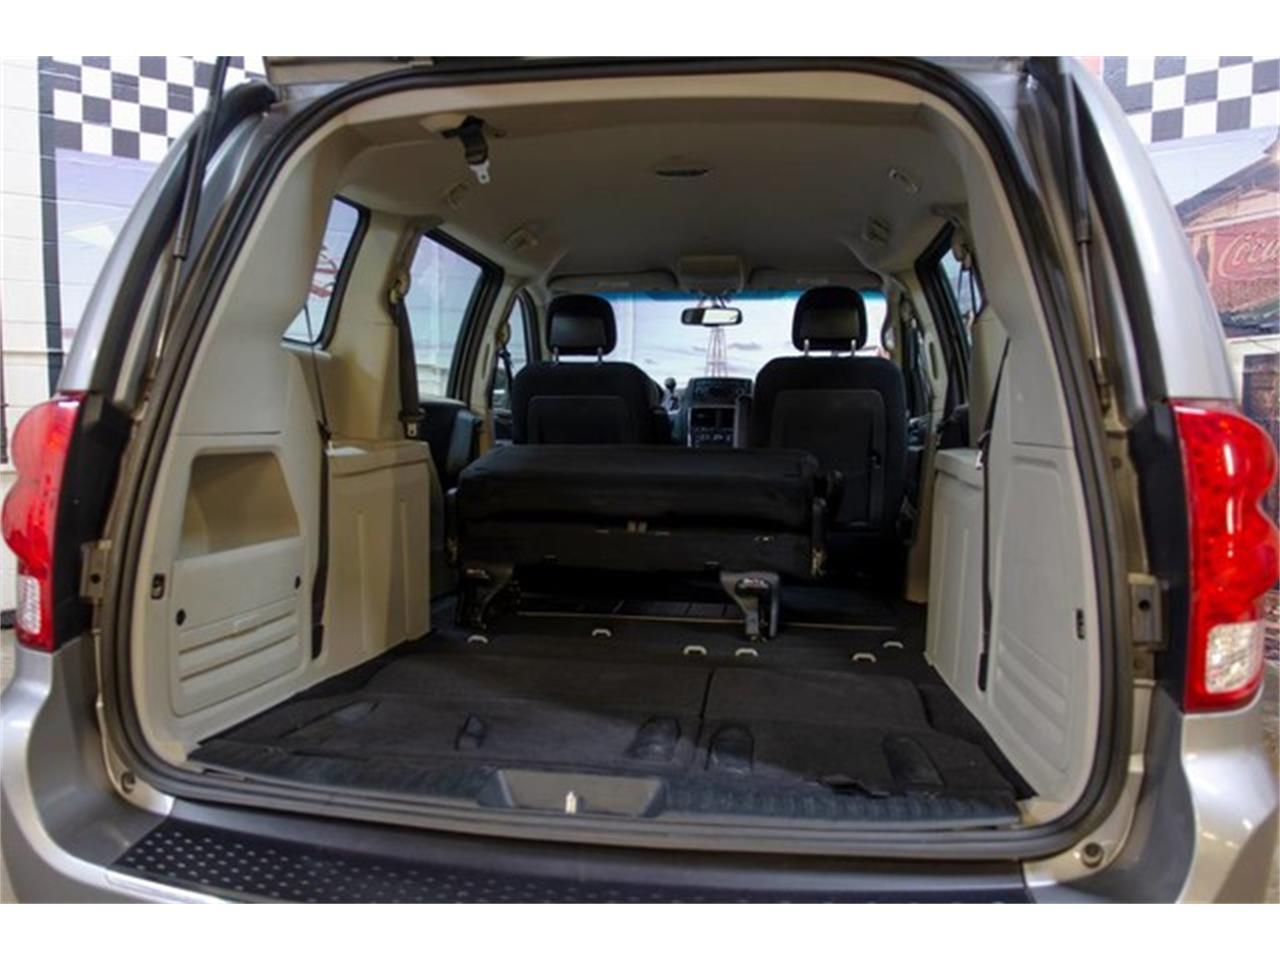 2014 Dodge Grand Caravan (CC-1393566) for sale in Bristol, Pennsylvania